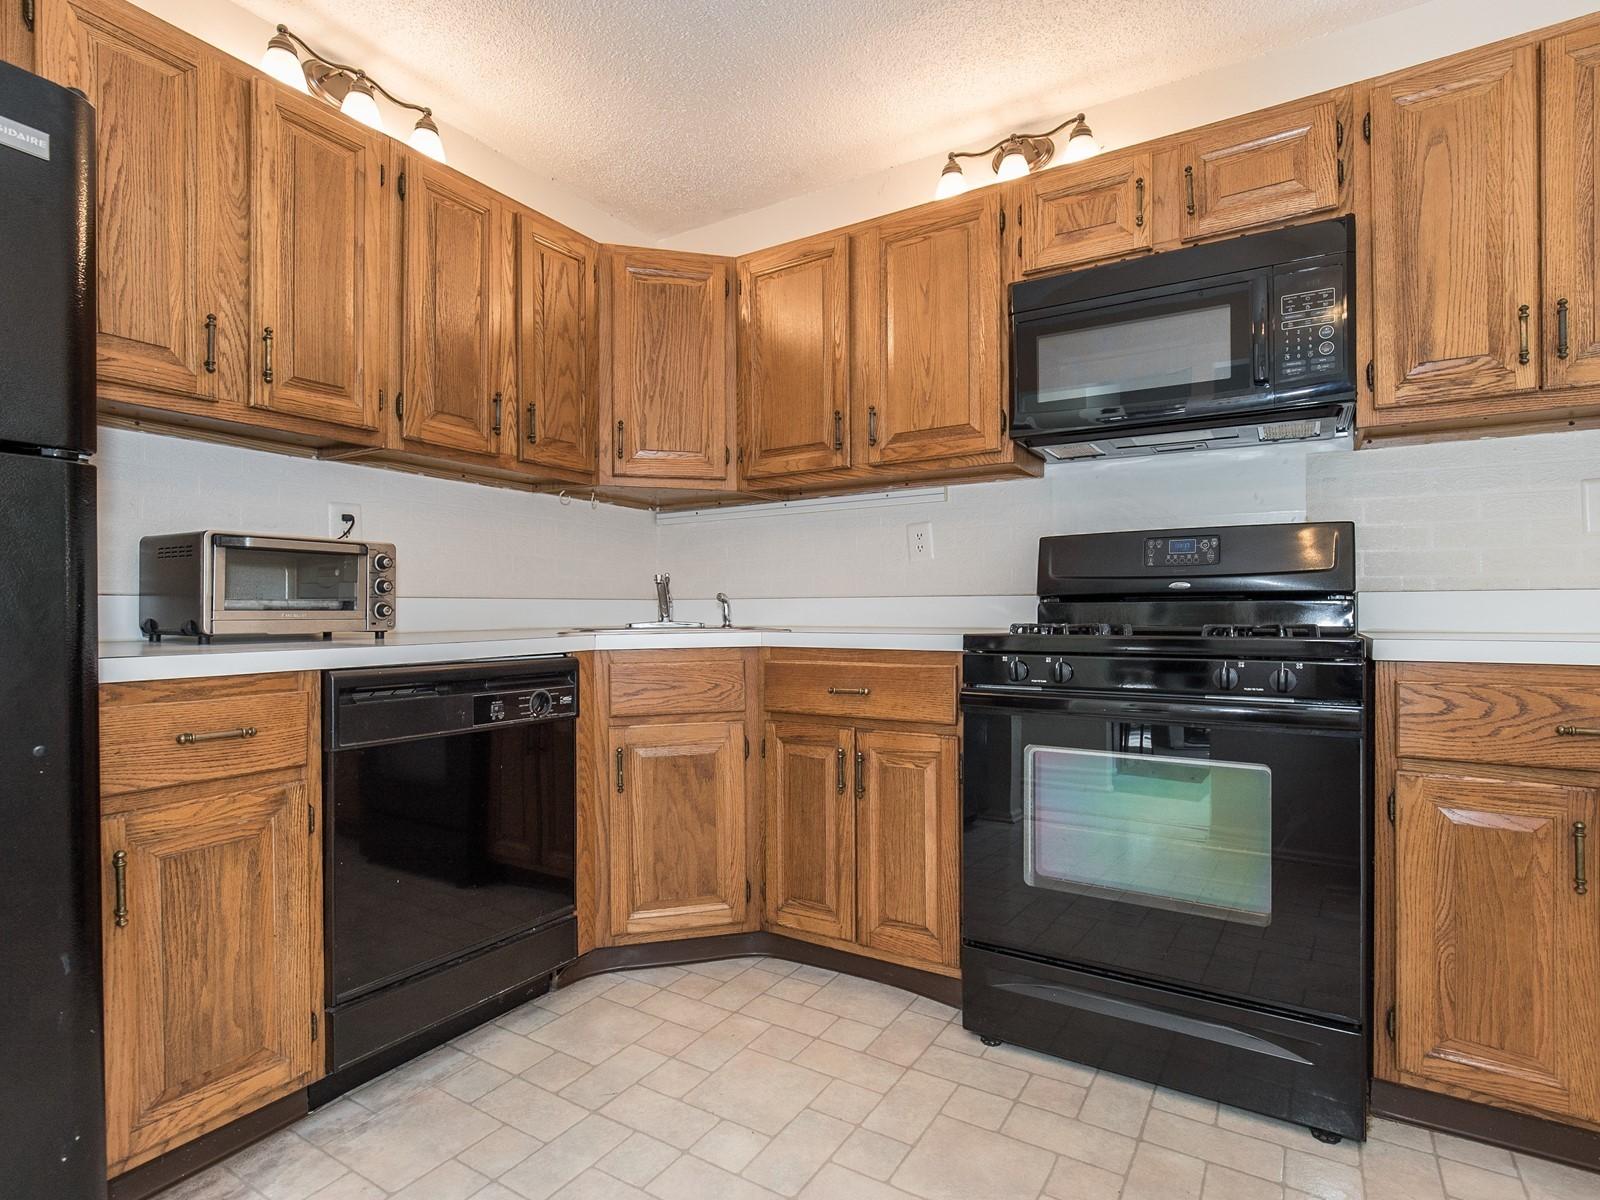 Piscataway 260 short term rental furnished kitchen